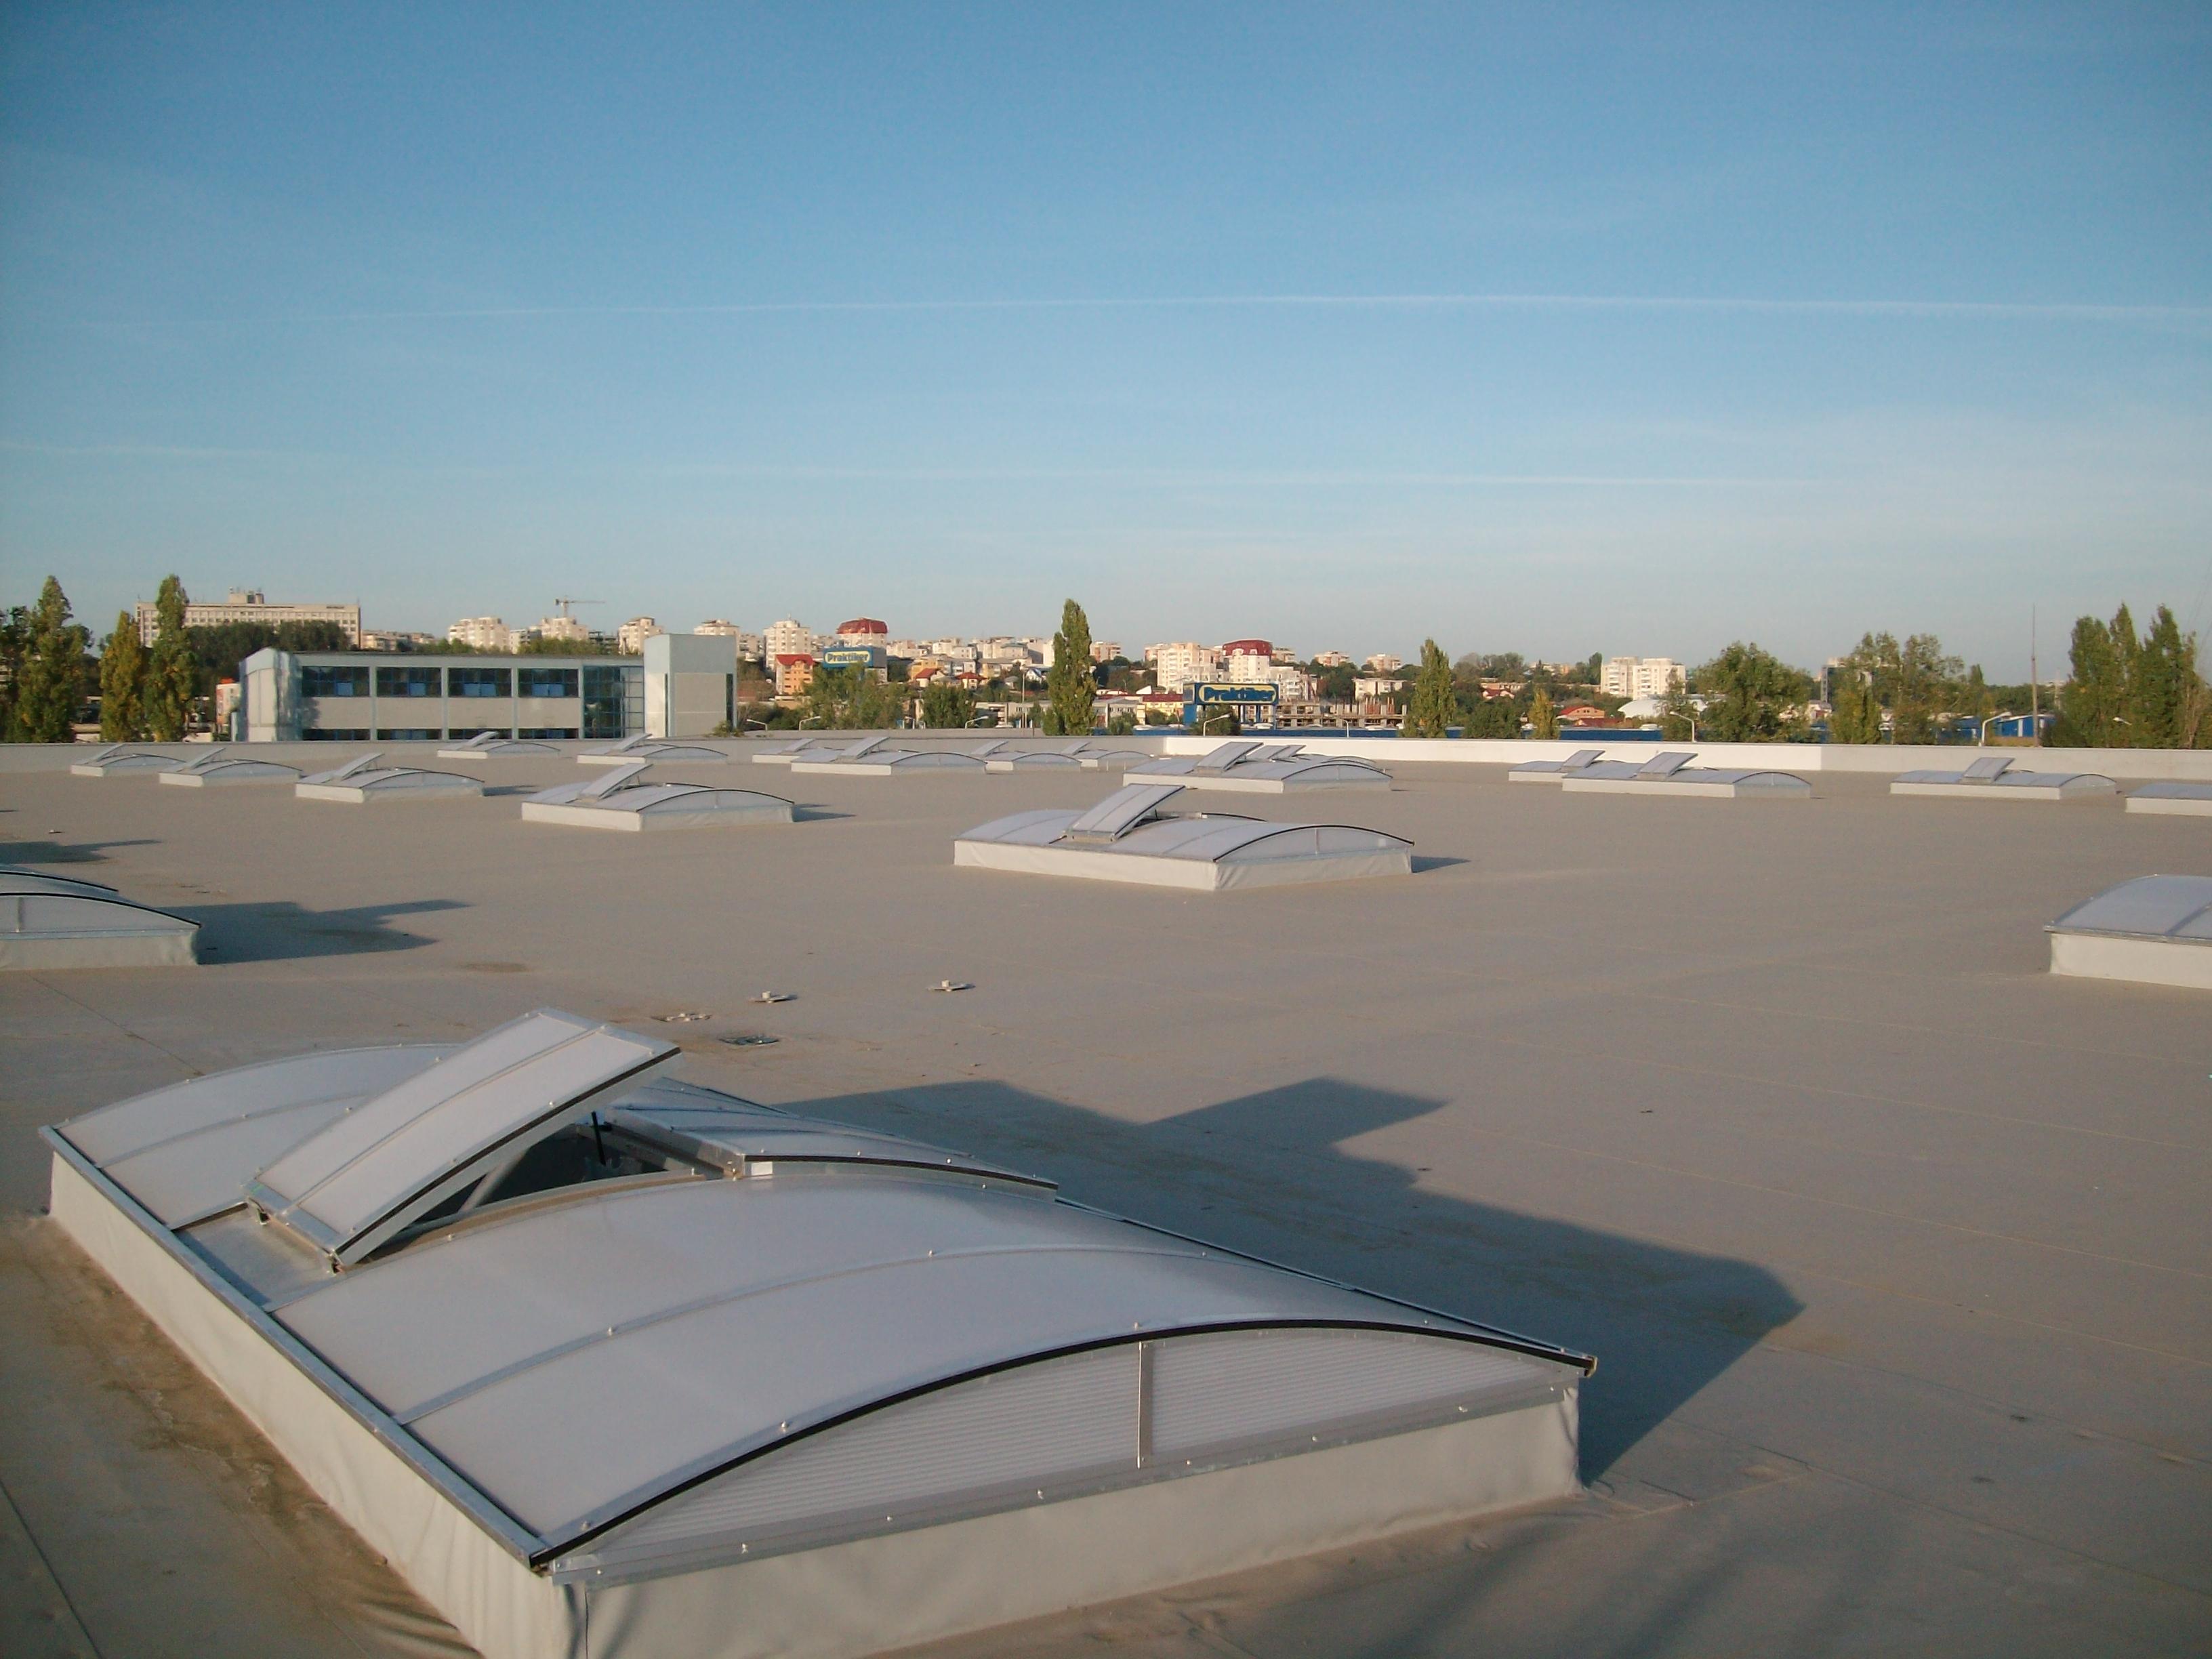 Luminatoare industriale - Spatiu comercial Baumax - Iasi HEXADOME - Poza 3